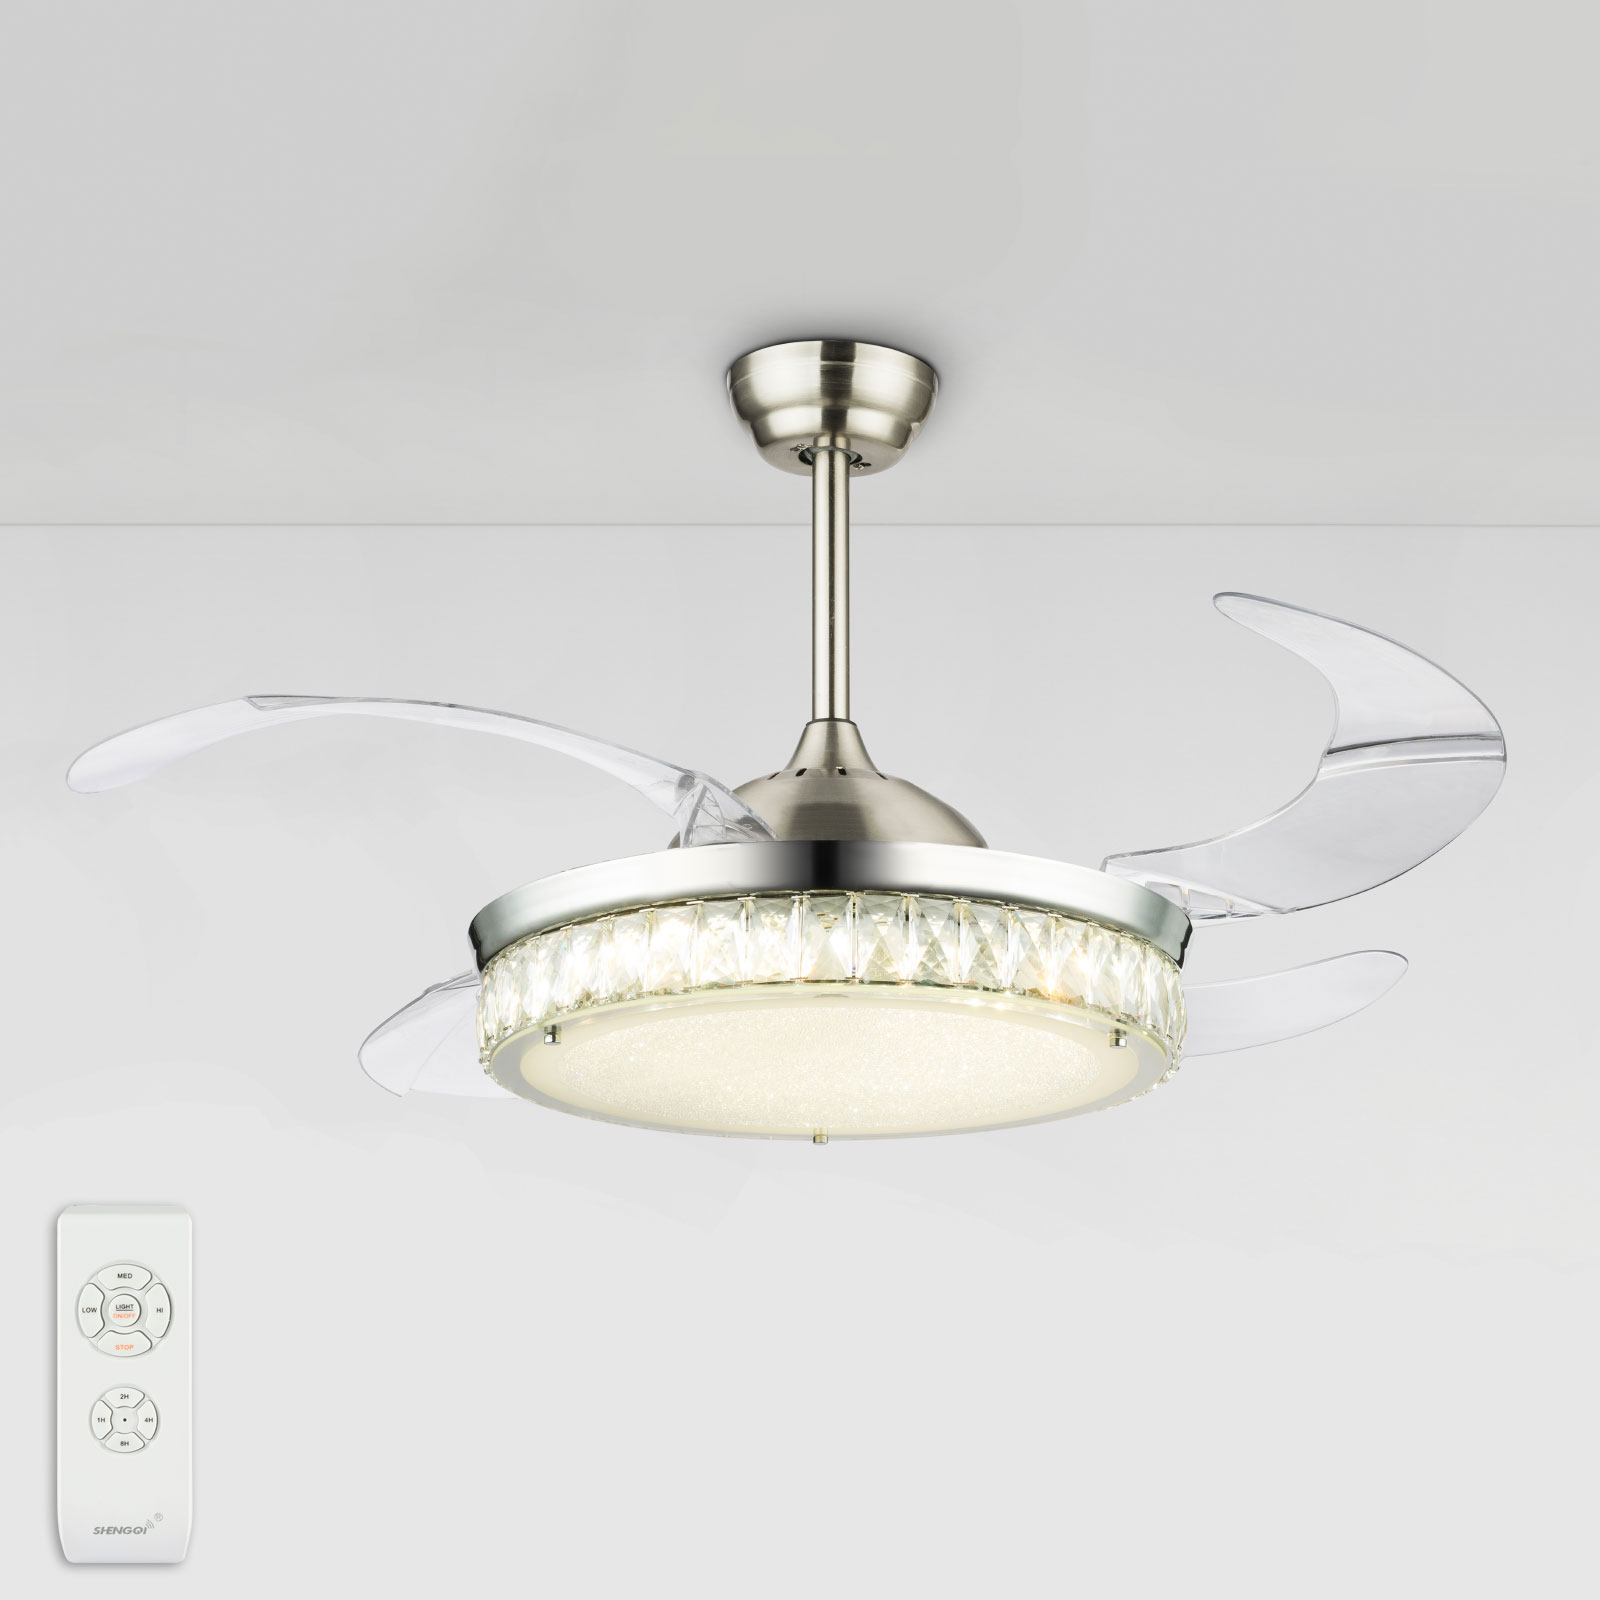 Cabrera LED-ventilator, flere lysfarver